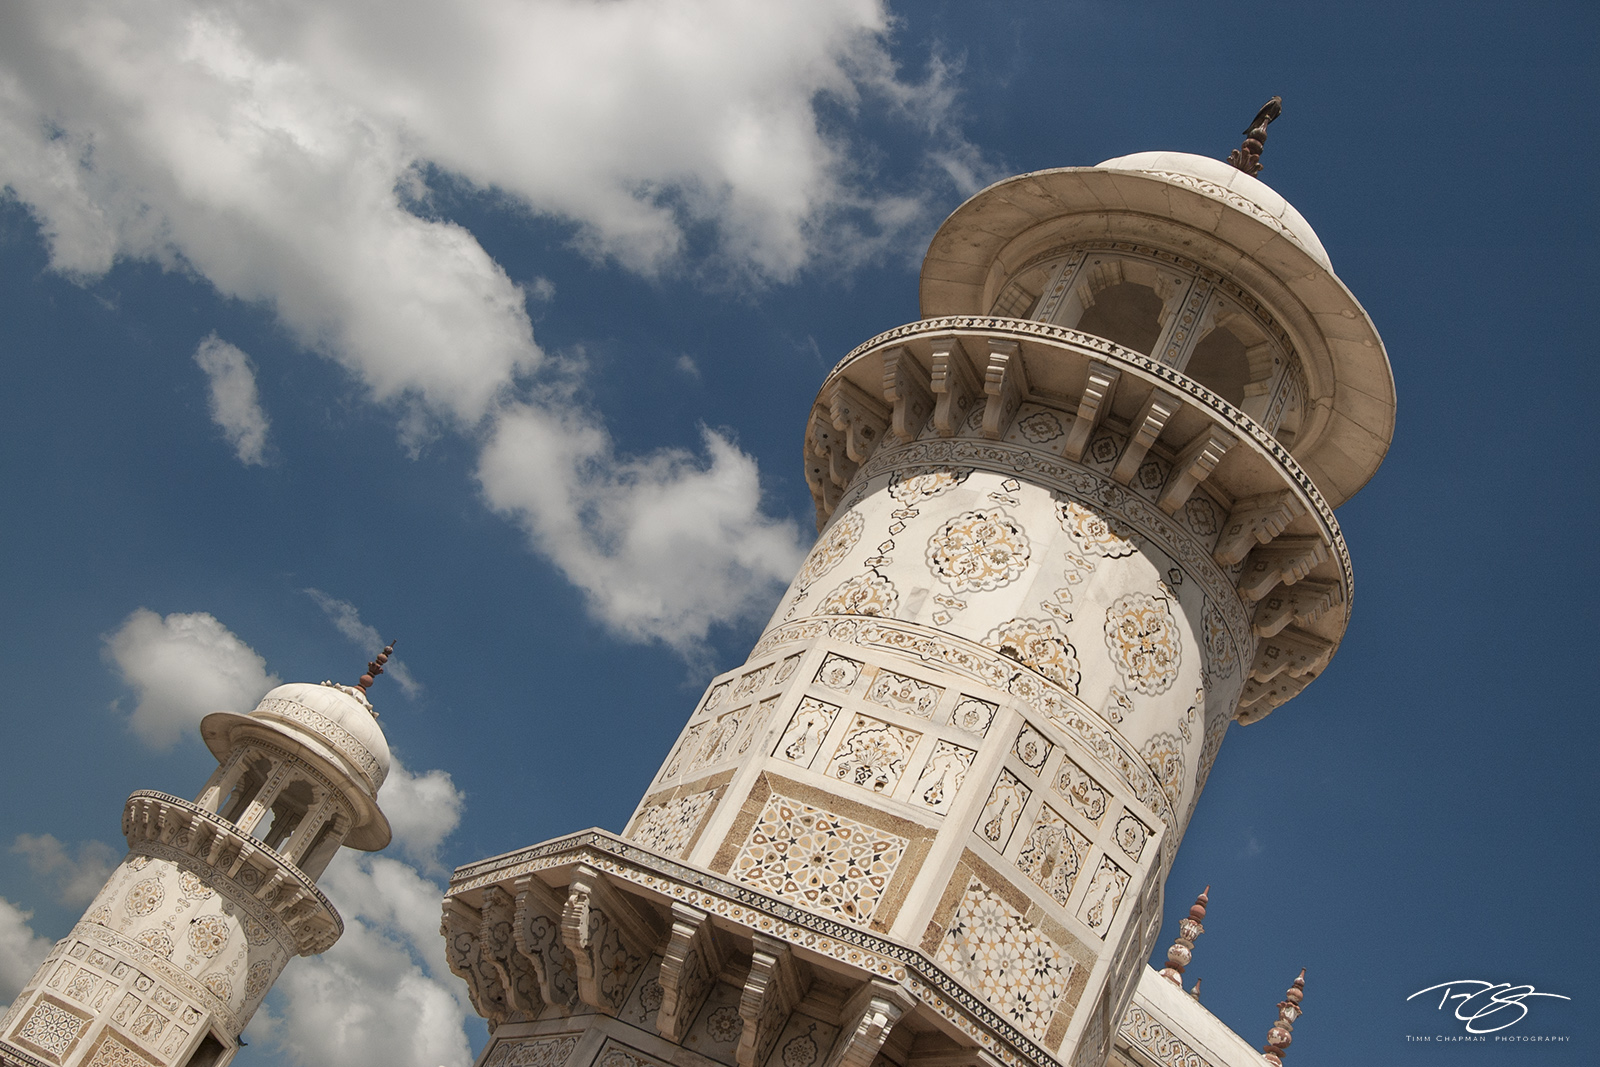 india, Itimad-Ud-Daulah, mausoleum, marble, jewelery box, jewellery box, clouds, baby taj, agra, india mausoleum, temple, jewel box, architectural marvel, balance, perfection, mosque, photo